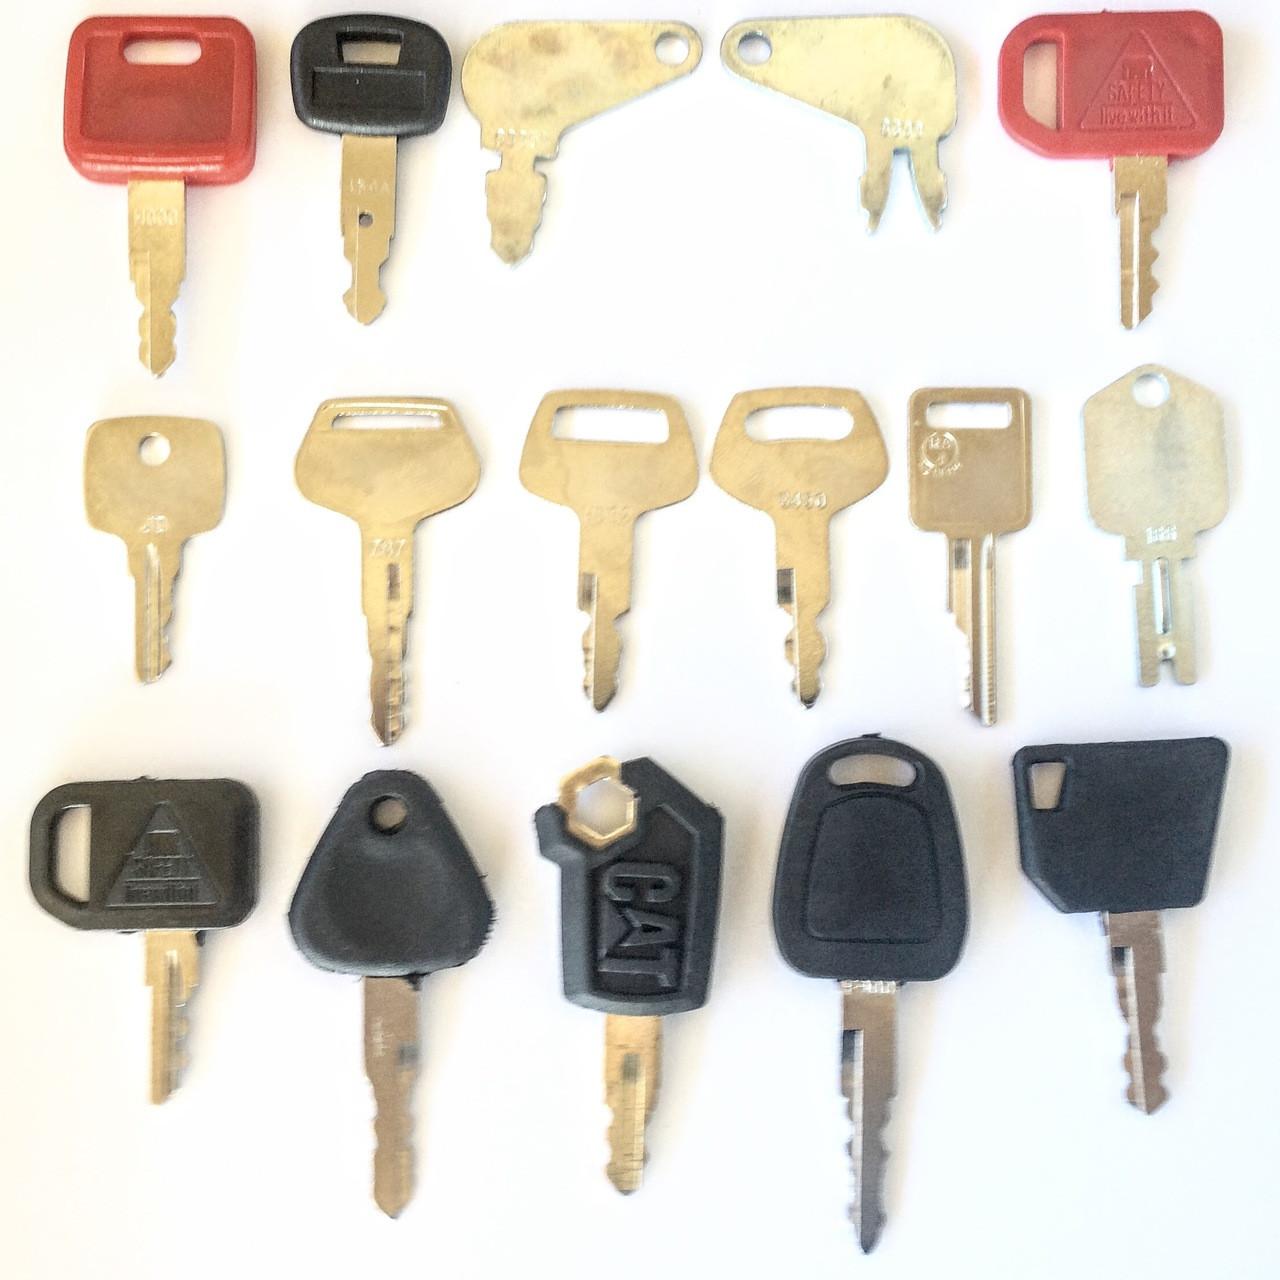 Construction Ignition Key Set